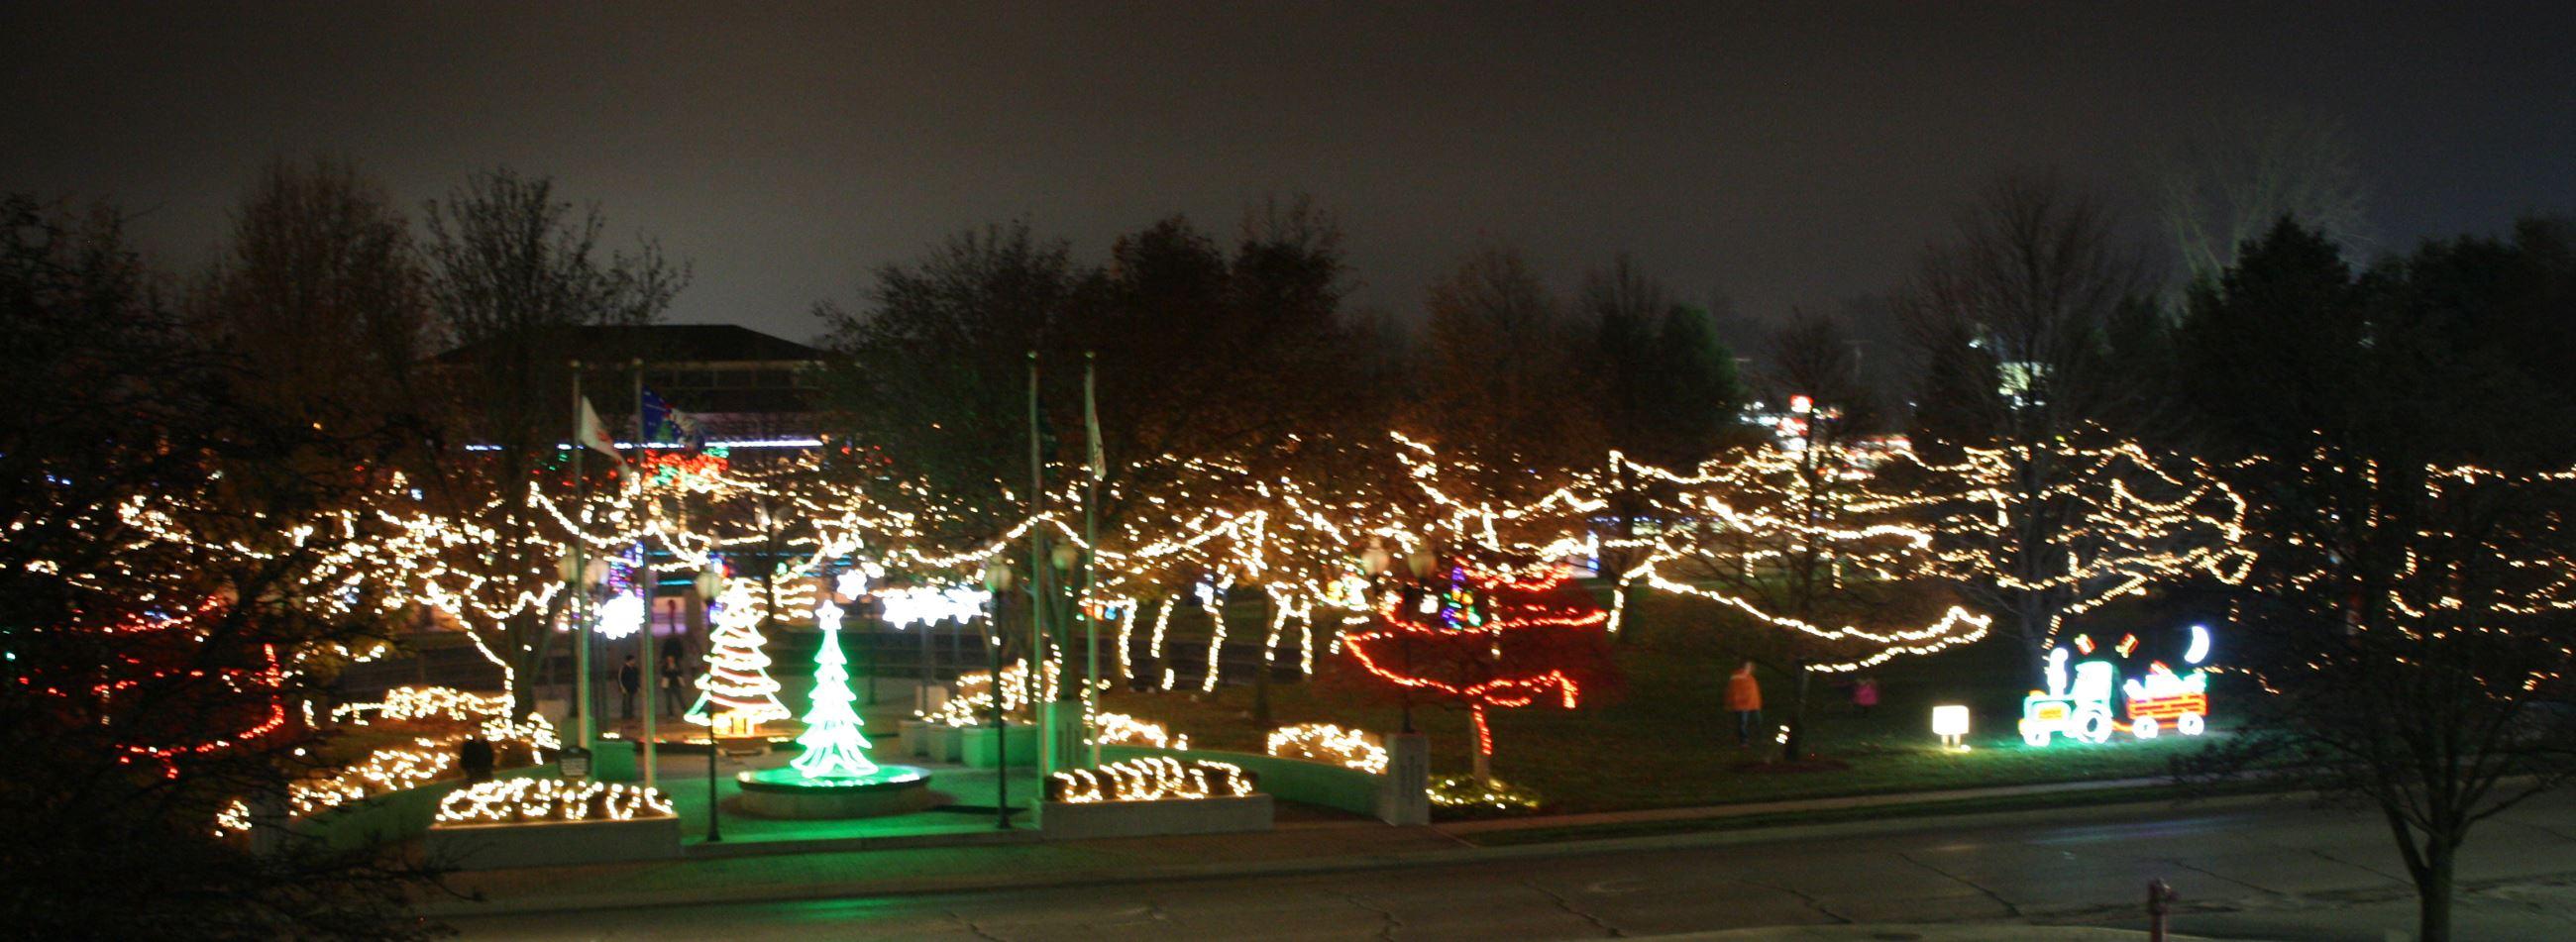 Nw Indiana Christmas Lights 2020 Christmas Light Displays In Northwest Indiana 2020 | Udtbkw